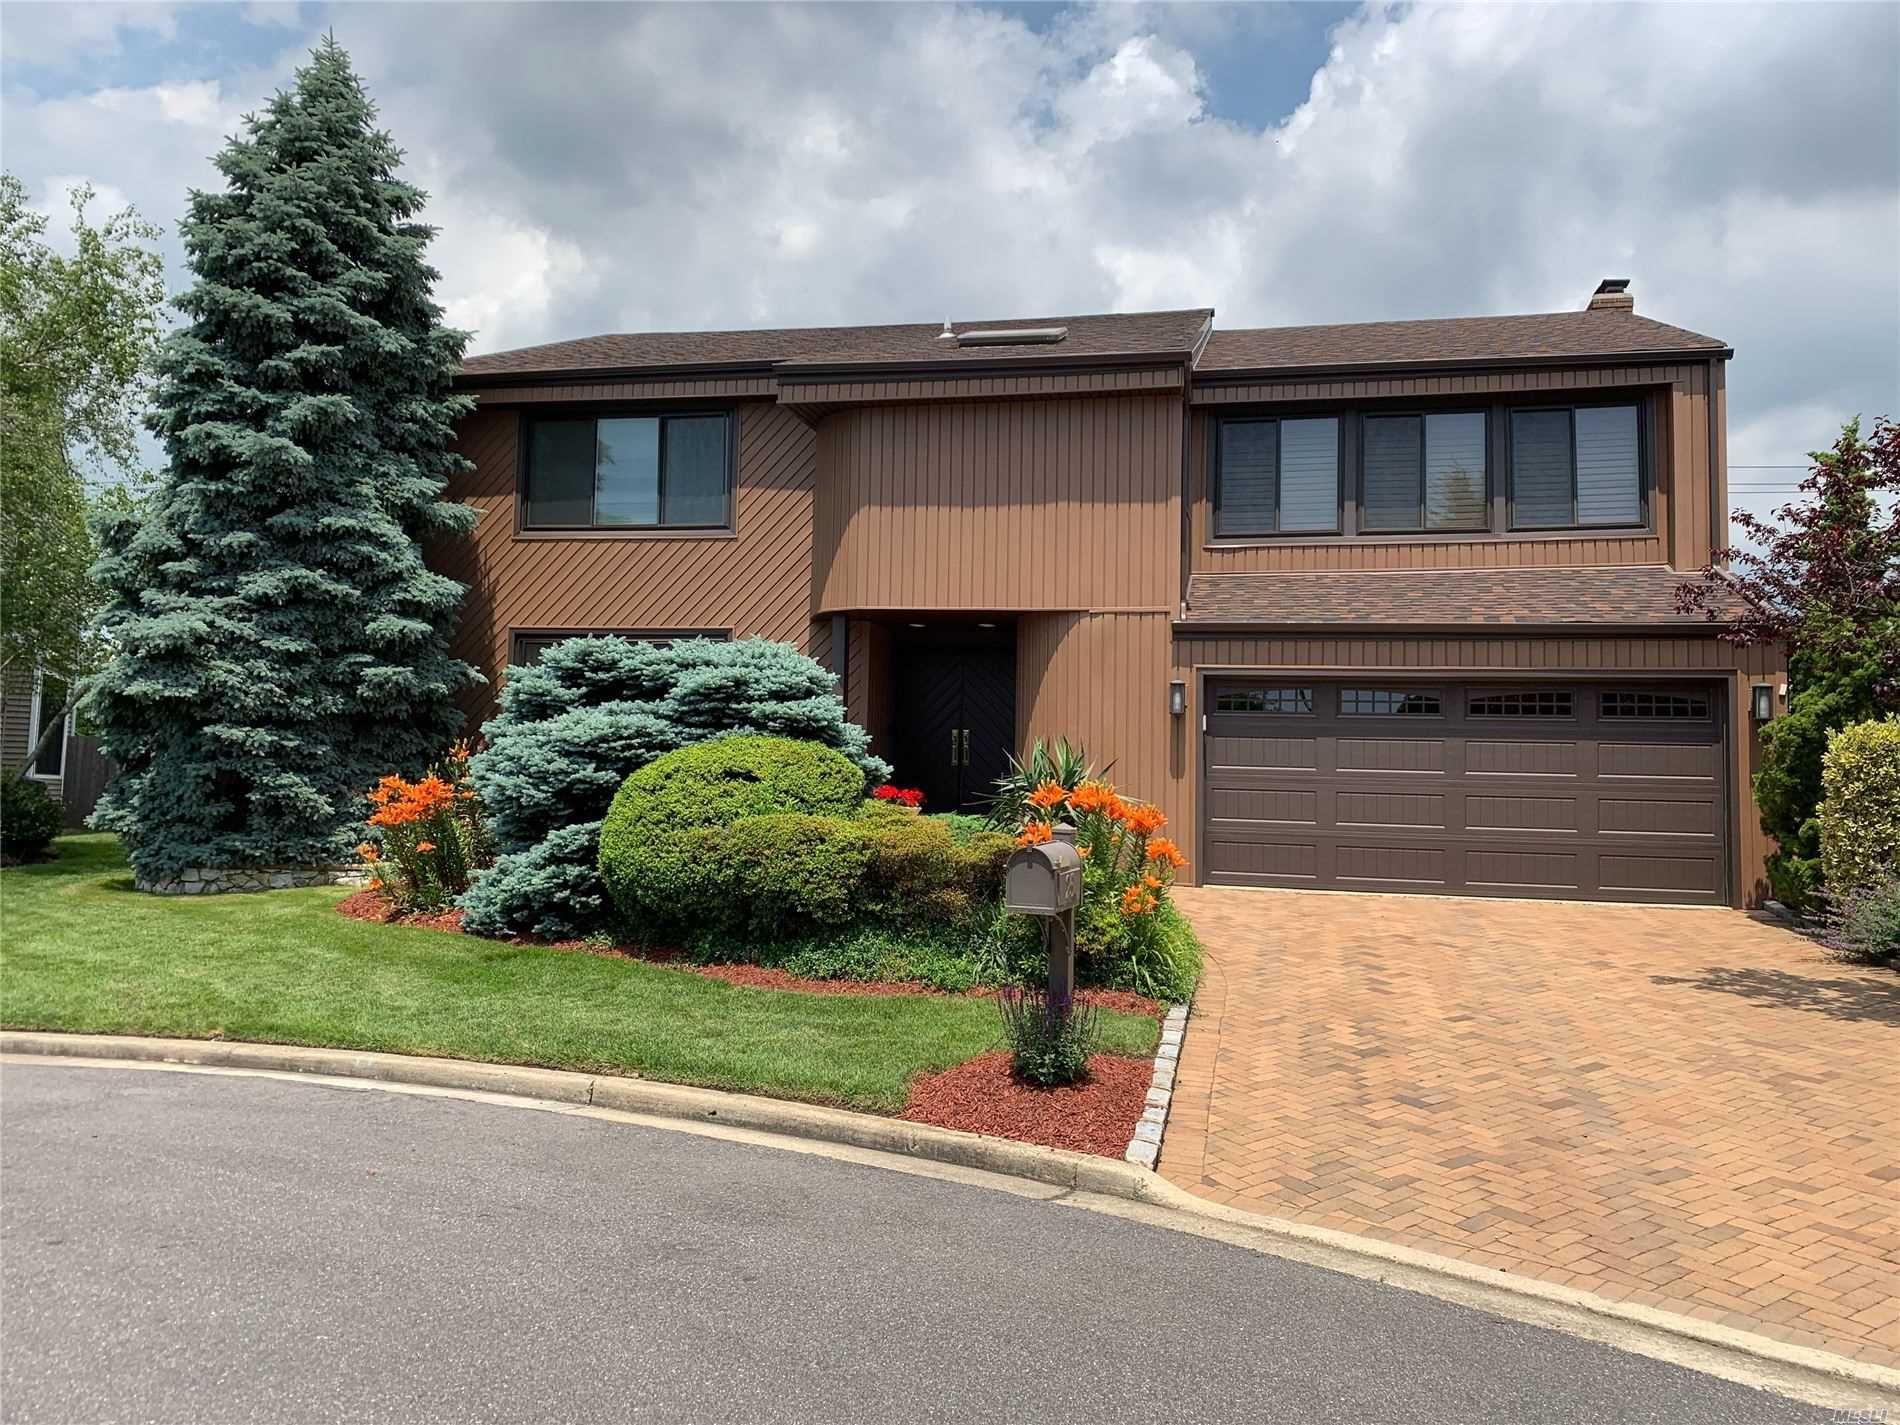 25 Princeton Drive, Syosset, NY 11791 - MLS#: 3224121